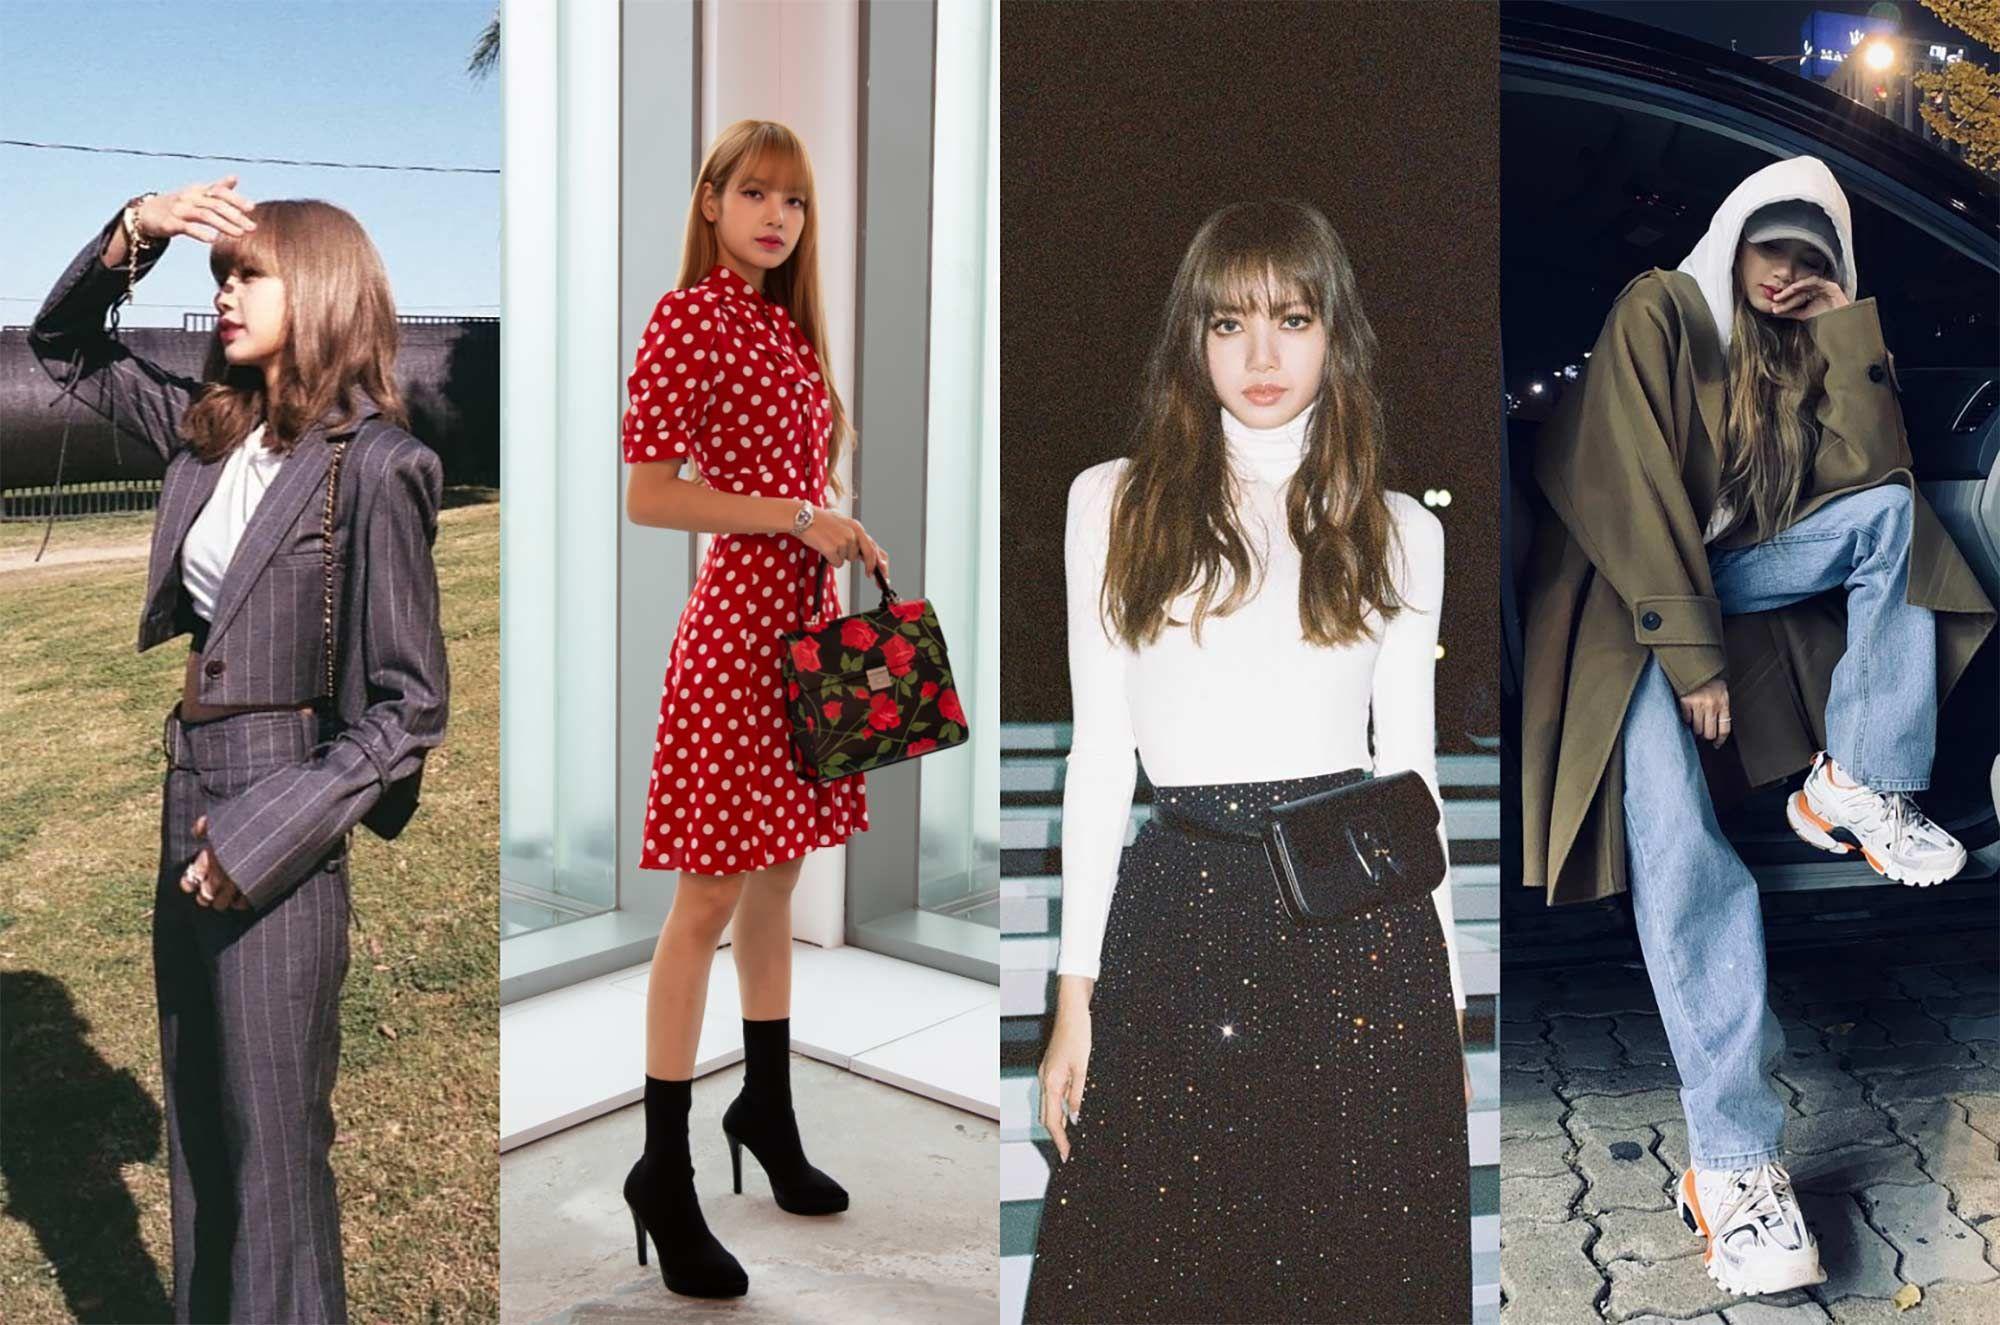 Blackpink's Lisa: The K-Pop Star's Most Fashionable Looks